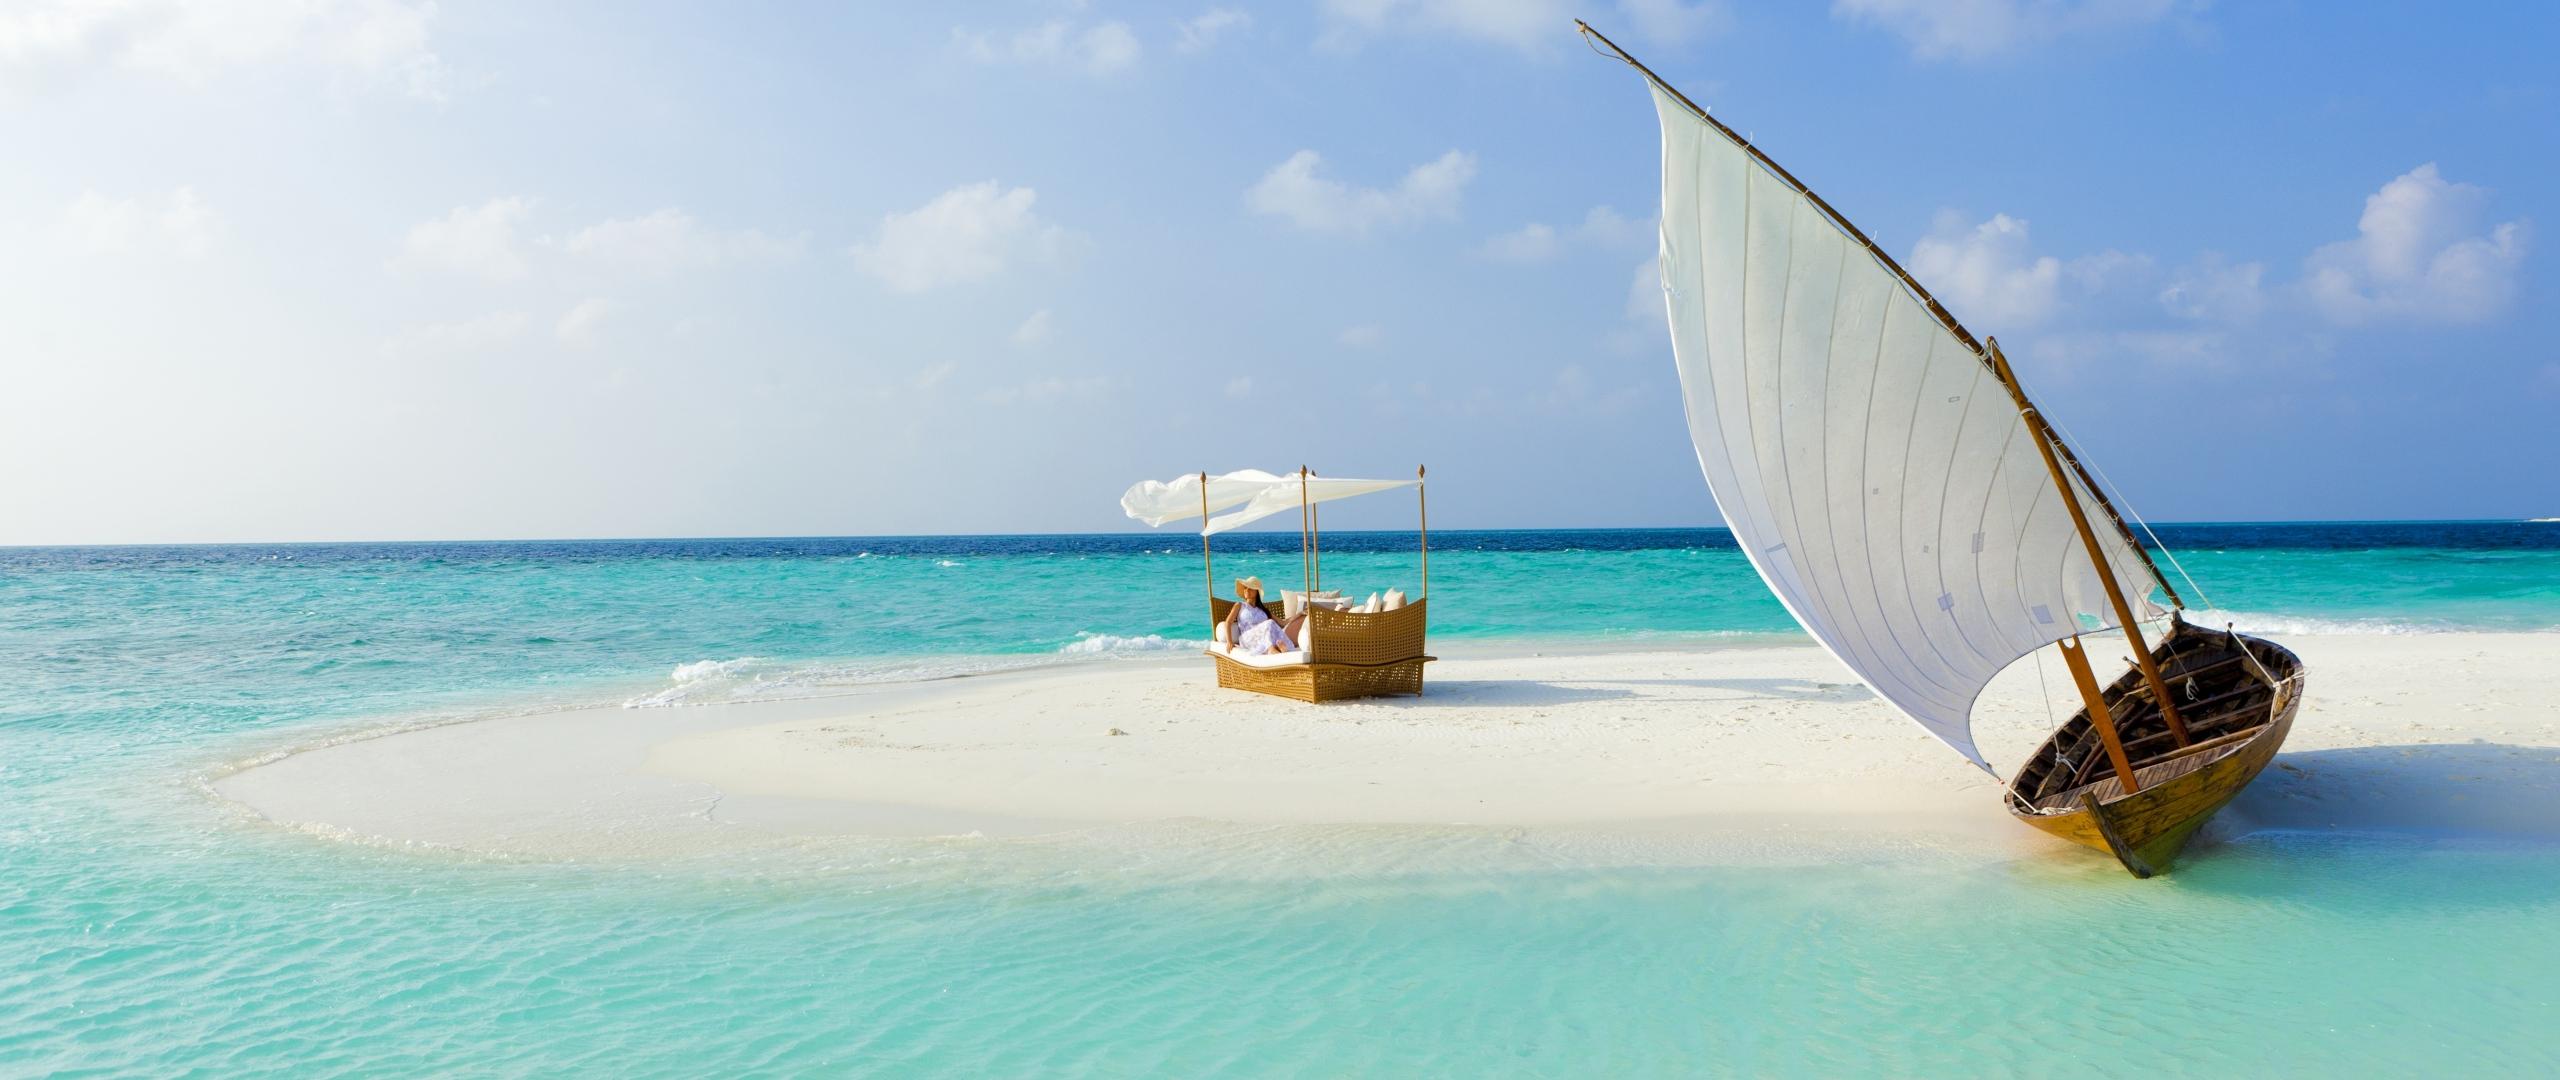 download wallpaper 2560x1080 maldives beach tropical sea hd wallpaper 2560x1080